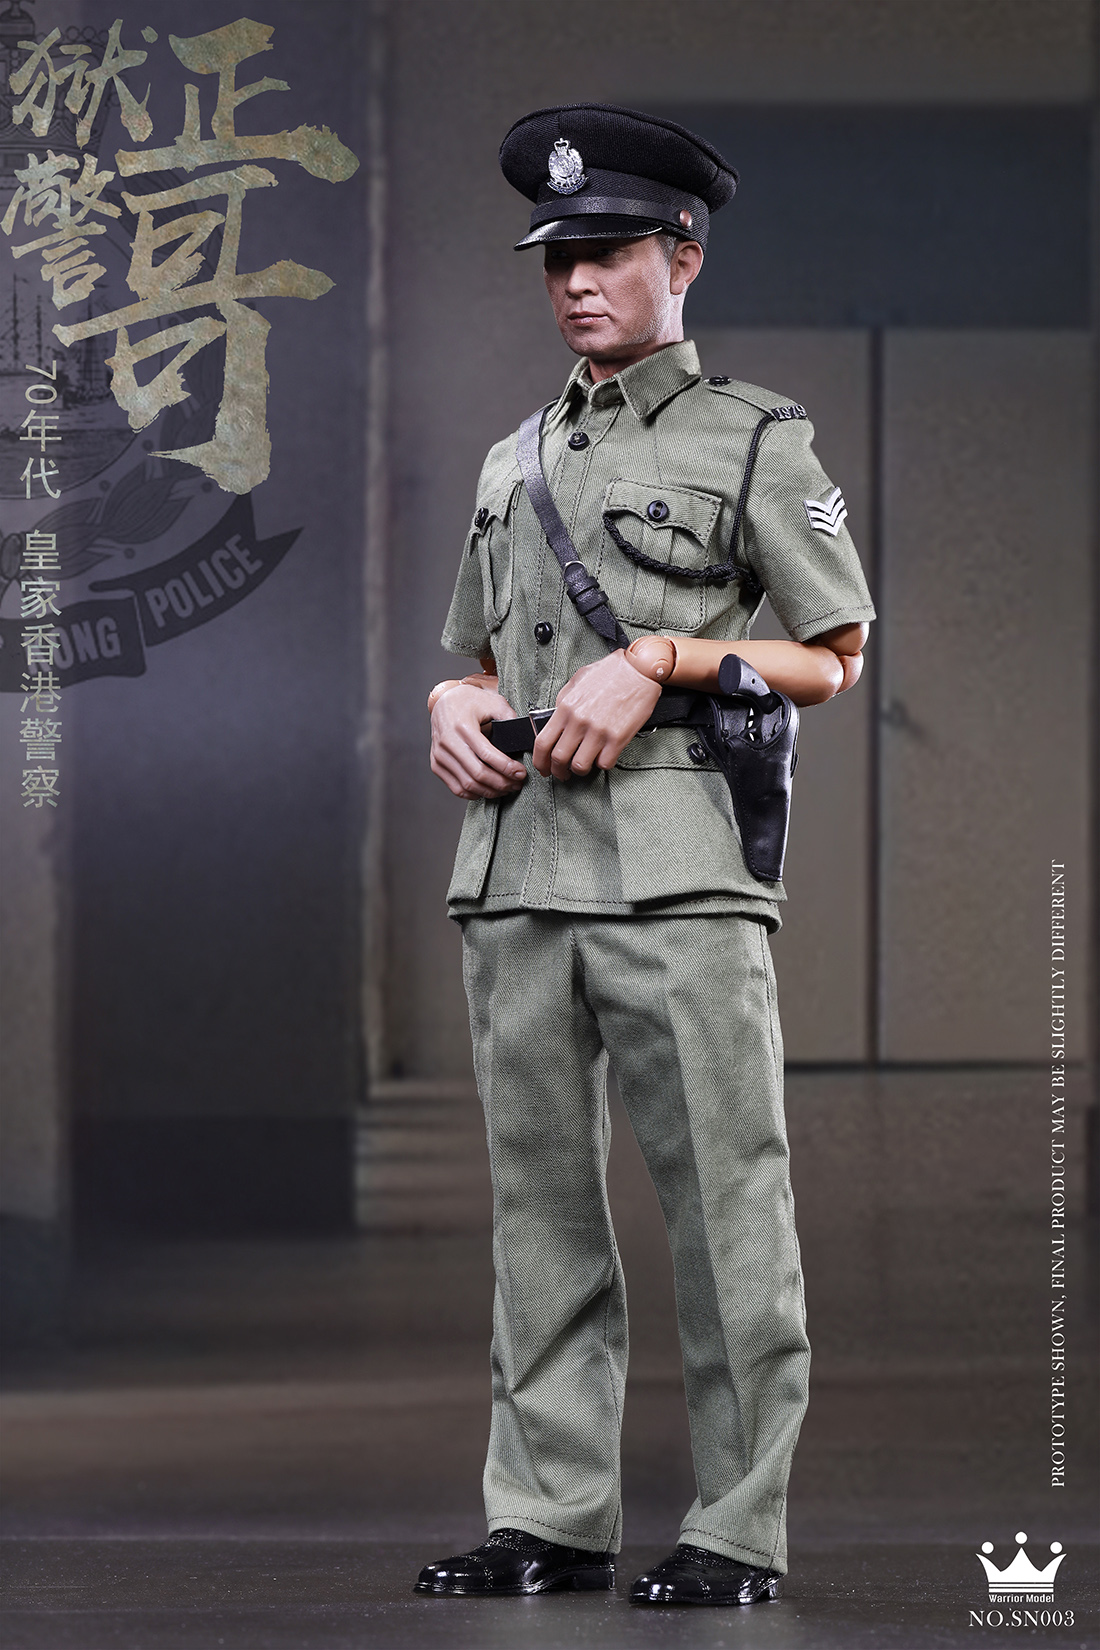 wm-hk-police05